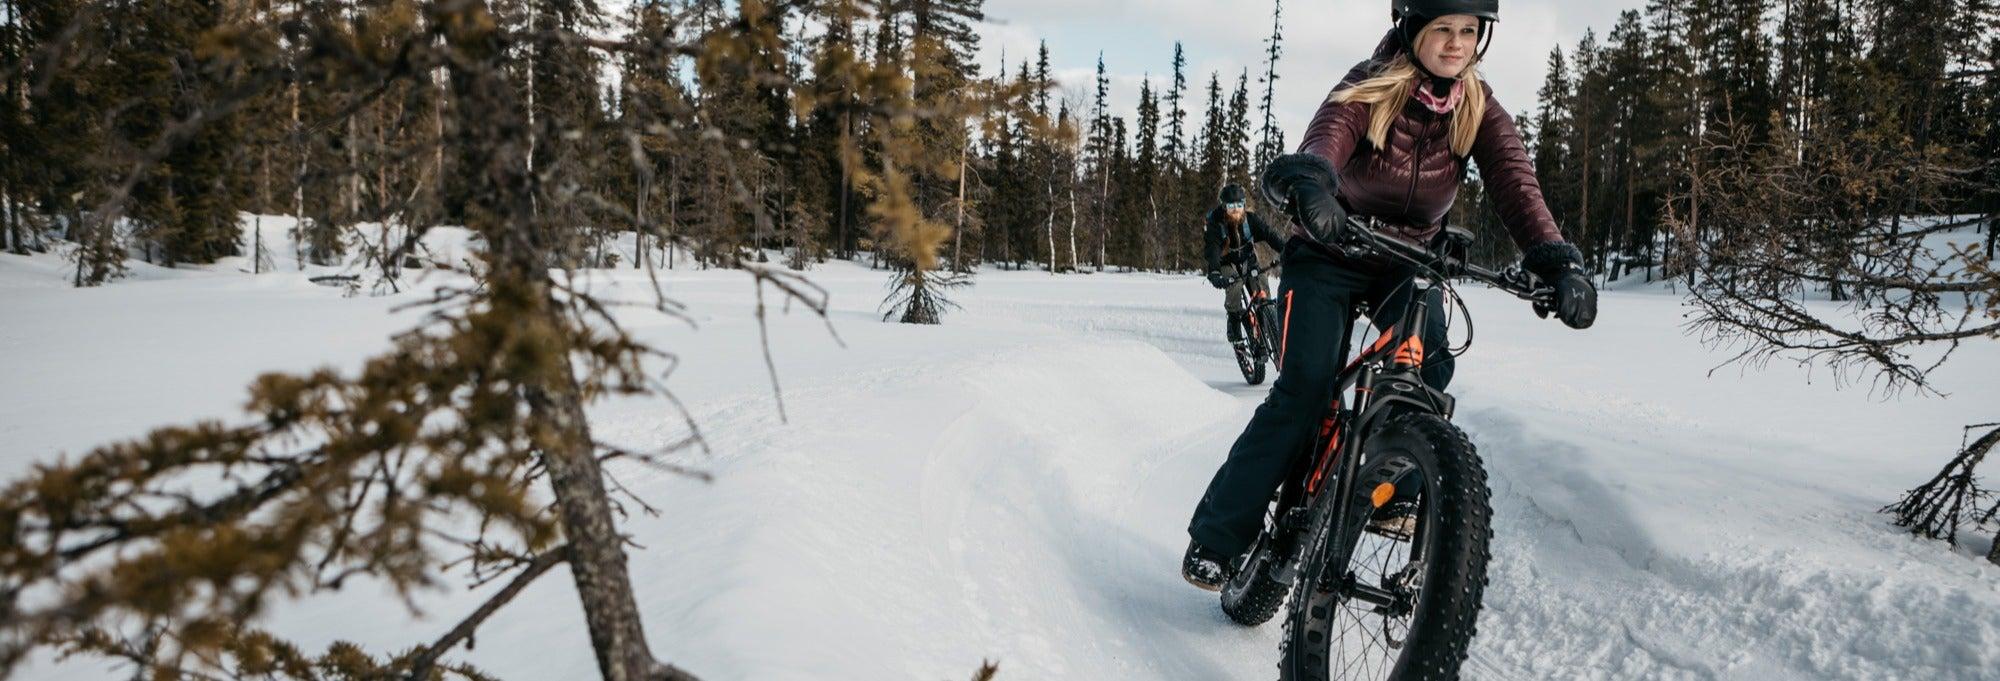 Tour en bicicleta eléctrica por Pallas-Yllästunturi